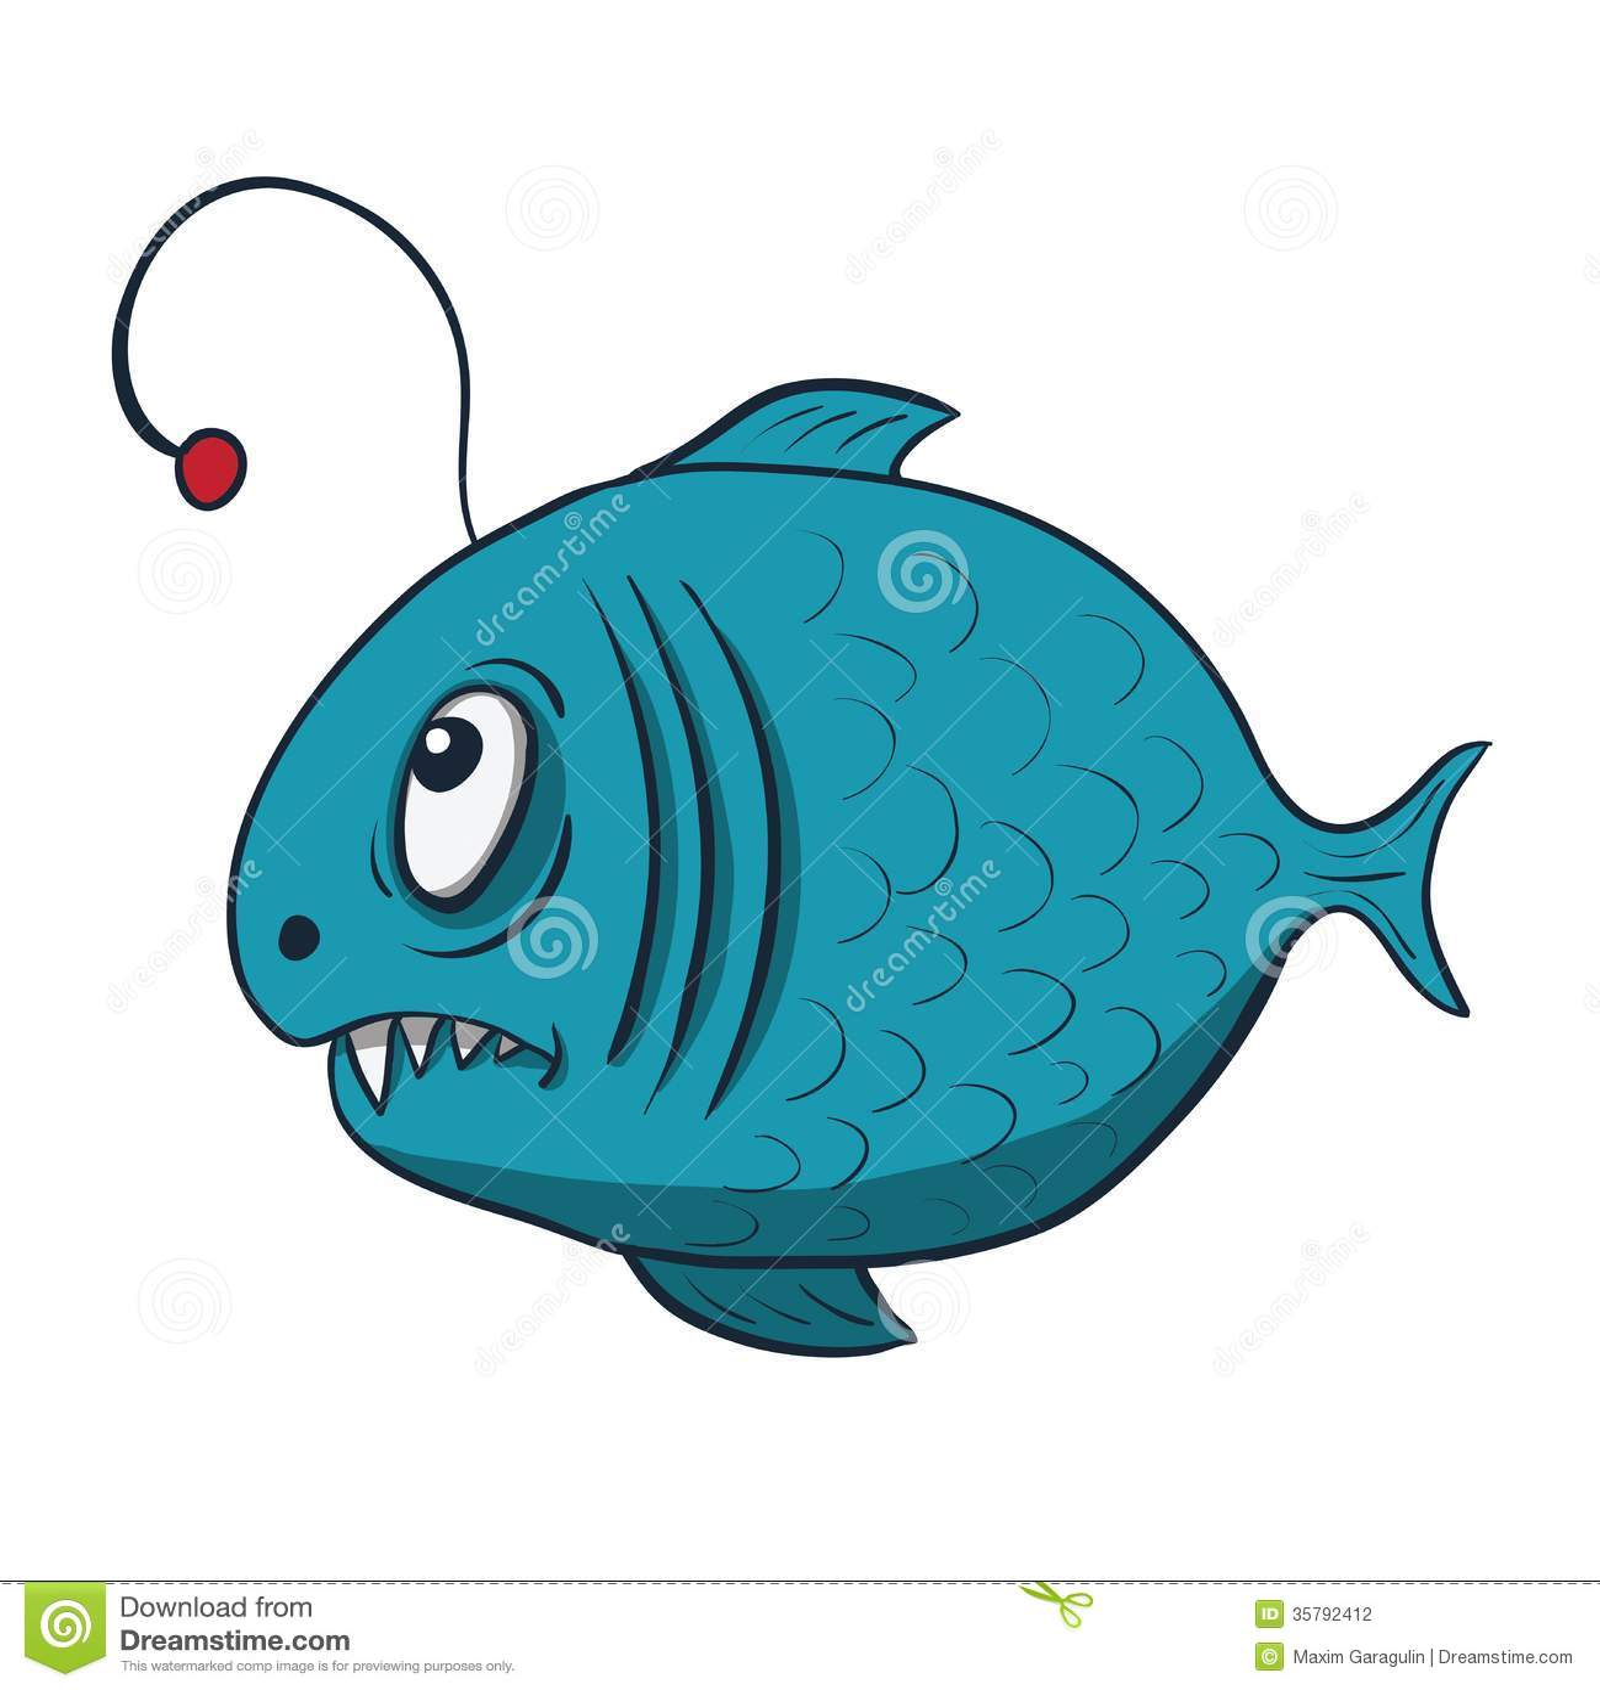 funny clipart fishing - photo #20